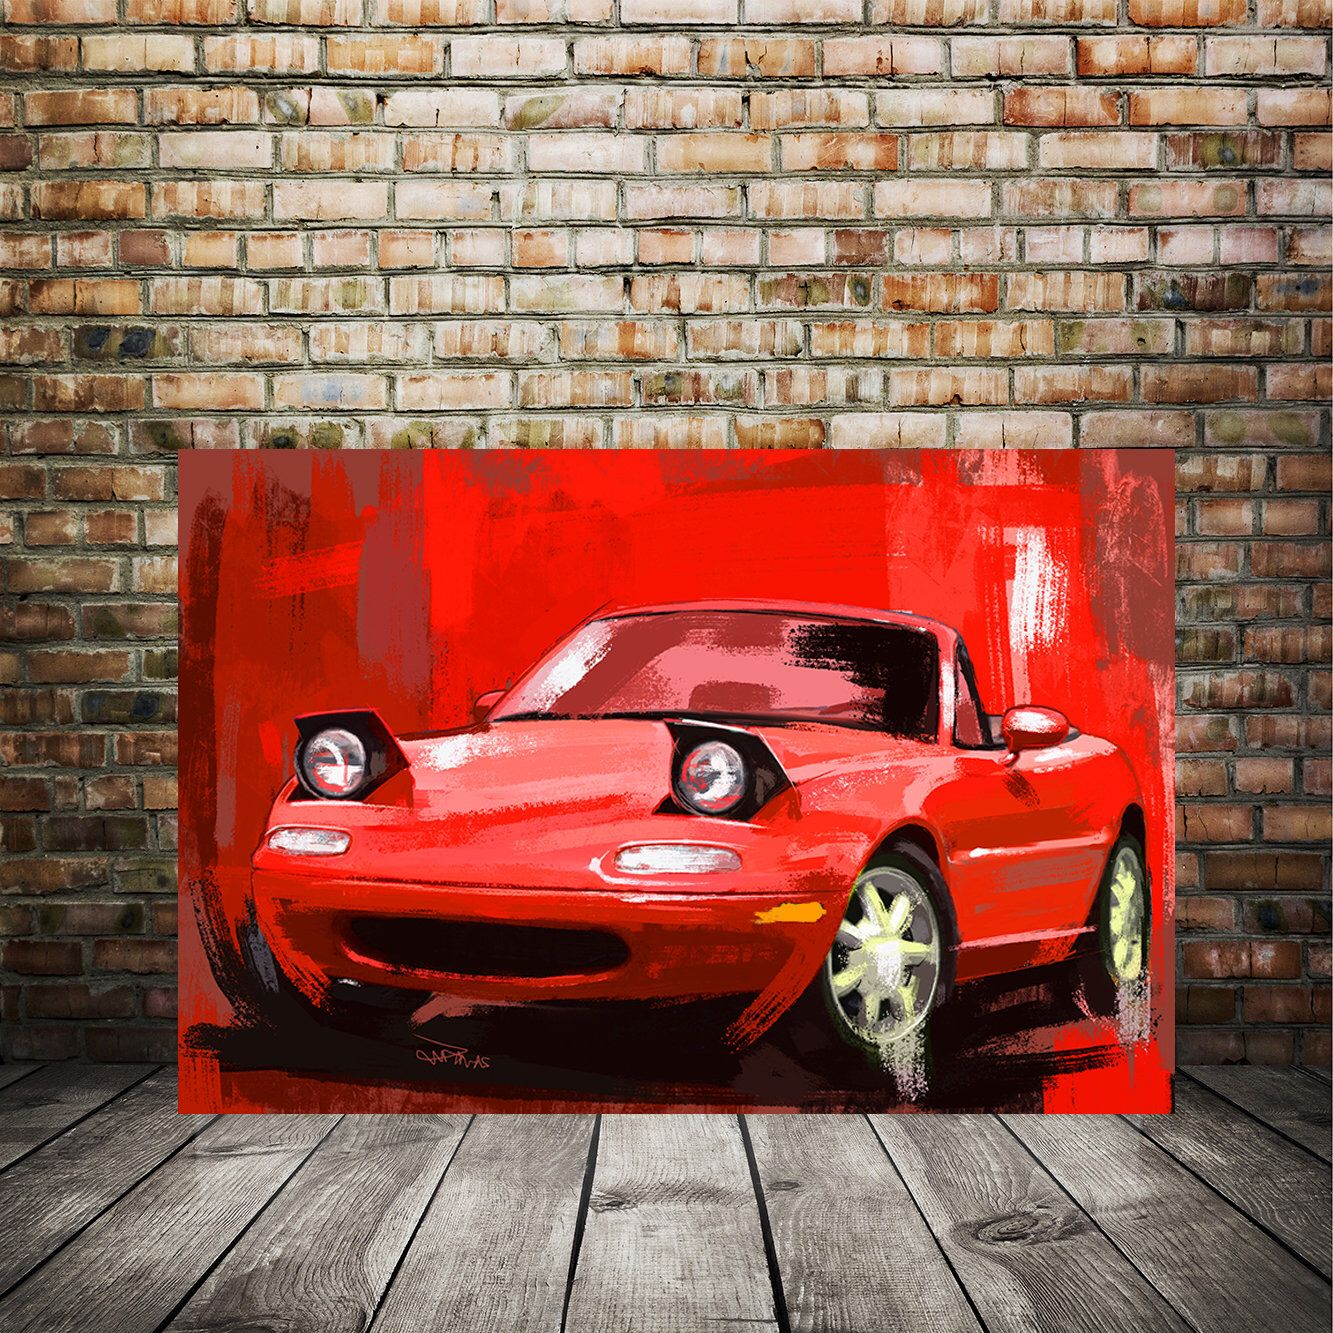 Mazda Miata Red Painting Automotive Decor Large Wall Art Etsy In 2020 Painting Large Wall Art Miata